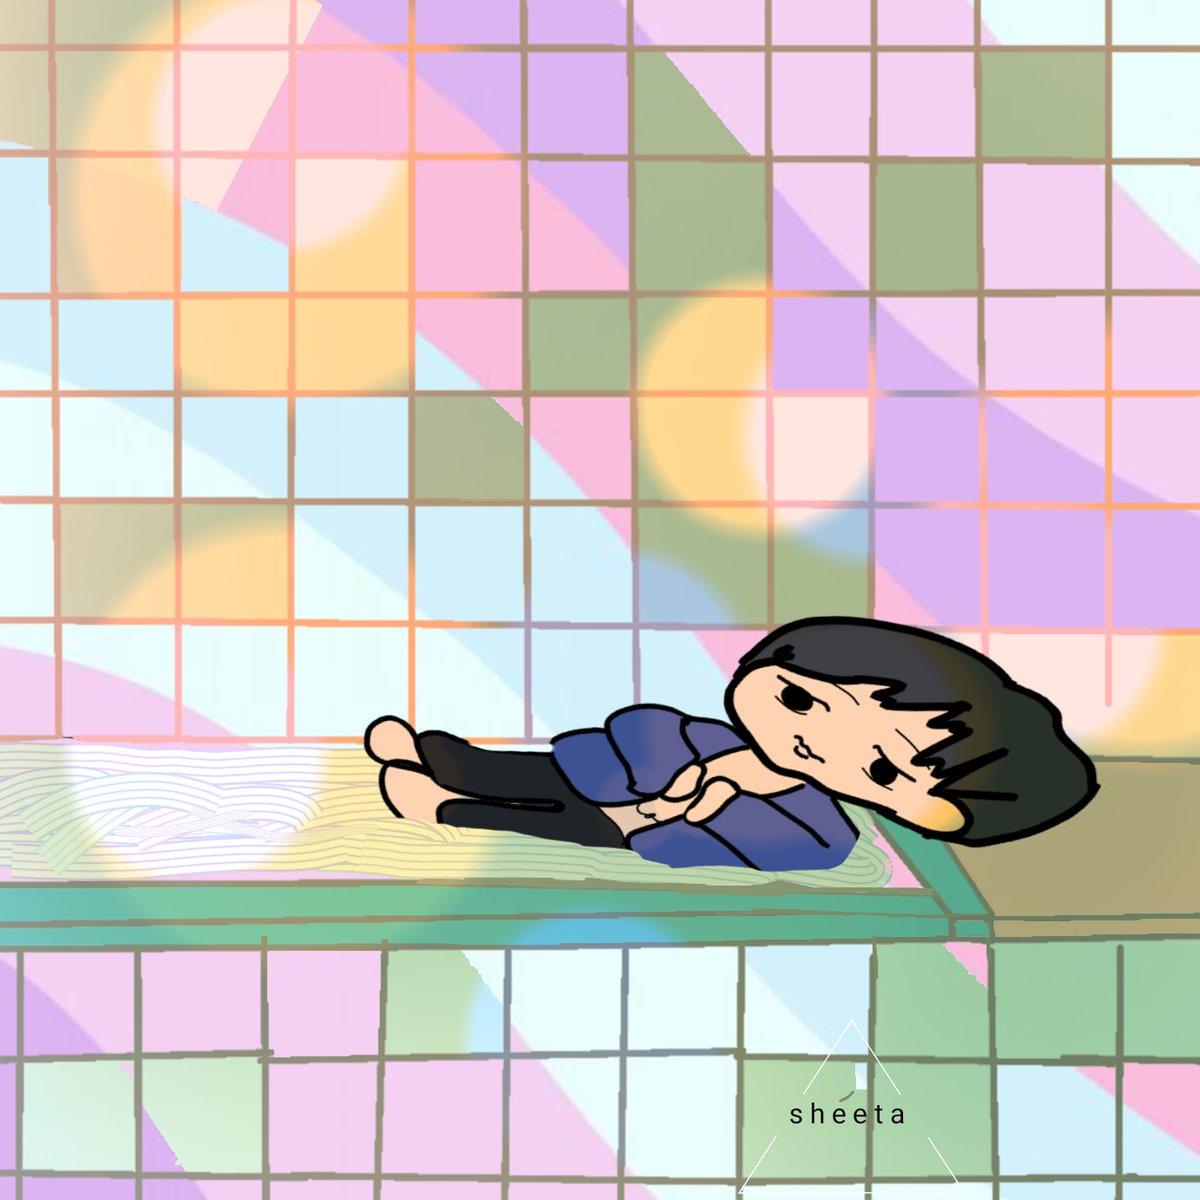 bathtub on sunday ❌❌ chibi version liltachi scene last night  #sketching #sketch #drawing #drawingoftheday #drawingart #fanart  #artwork  #art #artoftheday